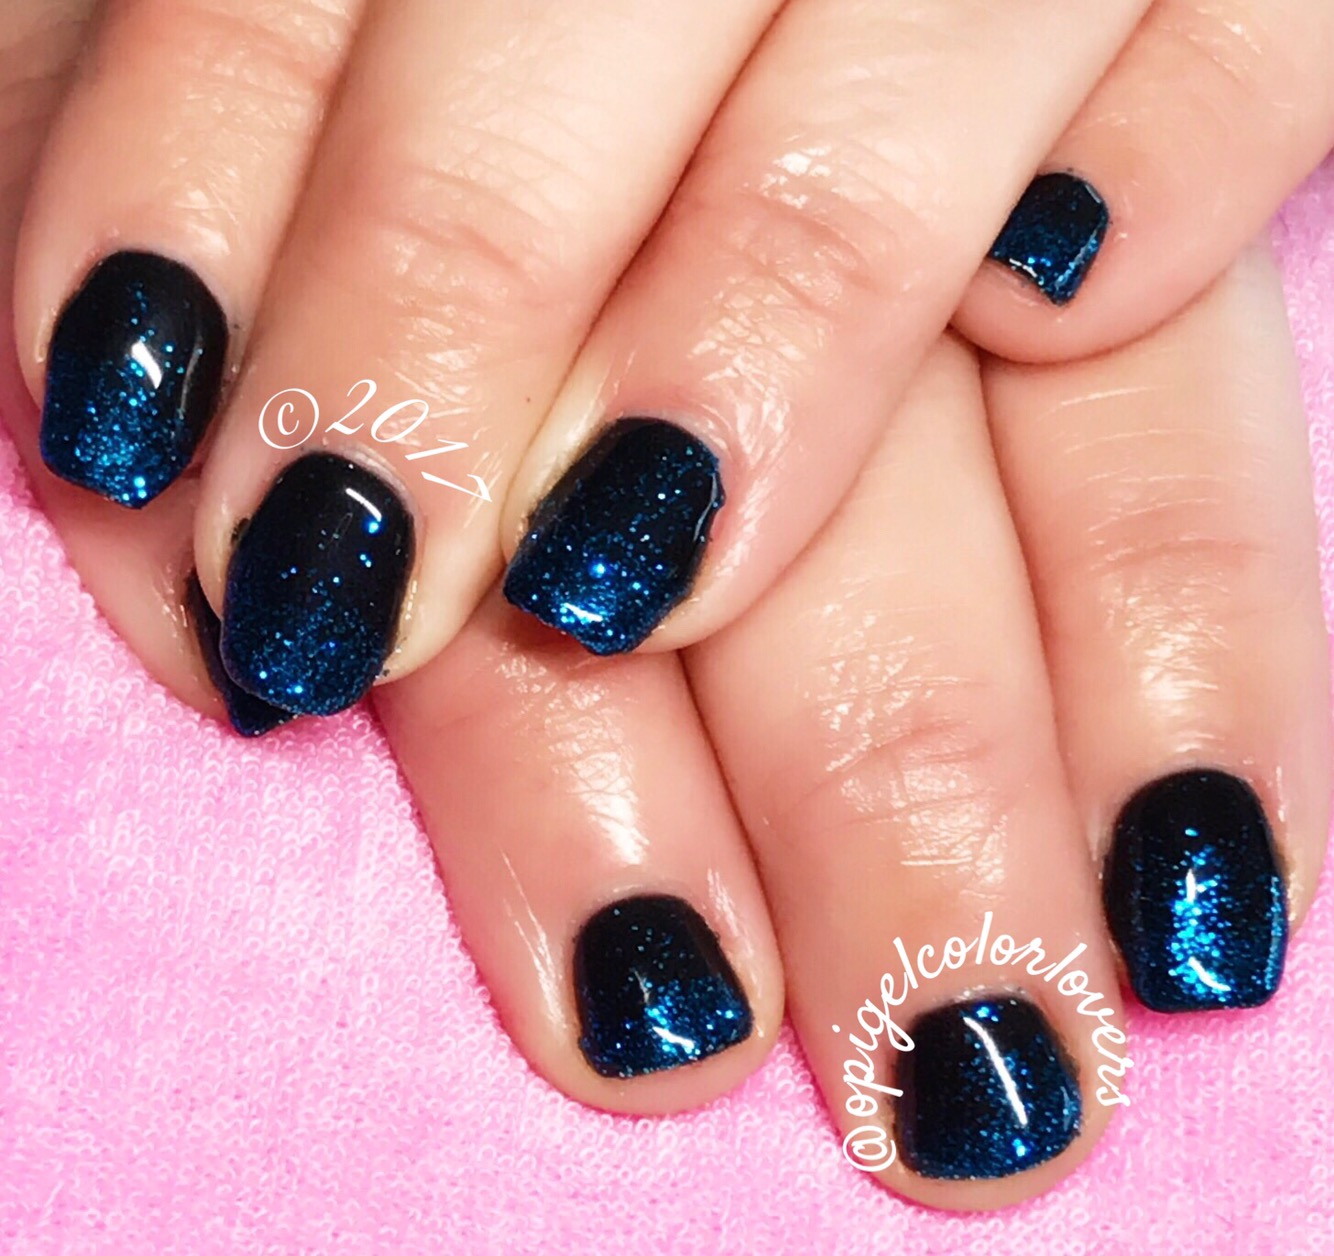 Black dress not optional opi - Manicure Monday Black Dress Not Optional Opi Gelcolor Lovers